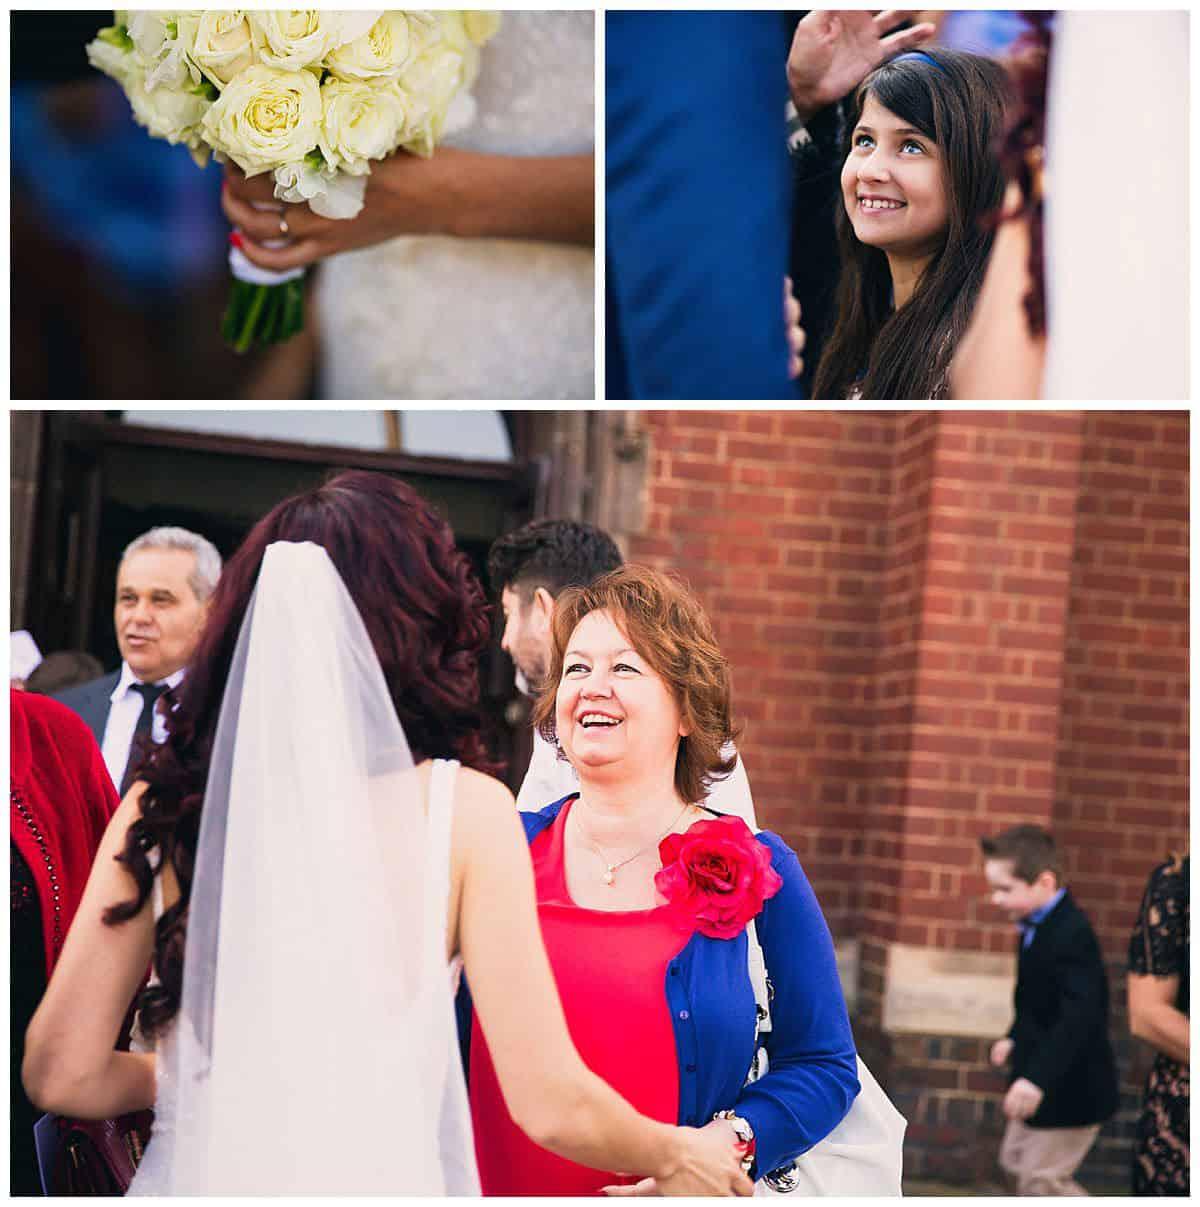 Congratulations from wedding guests at Kensington Church